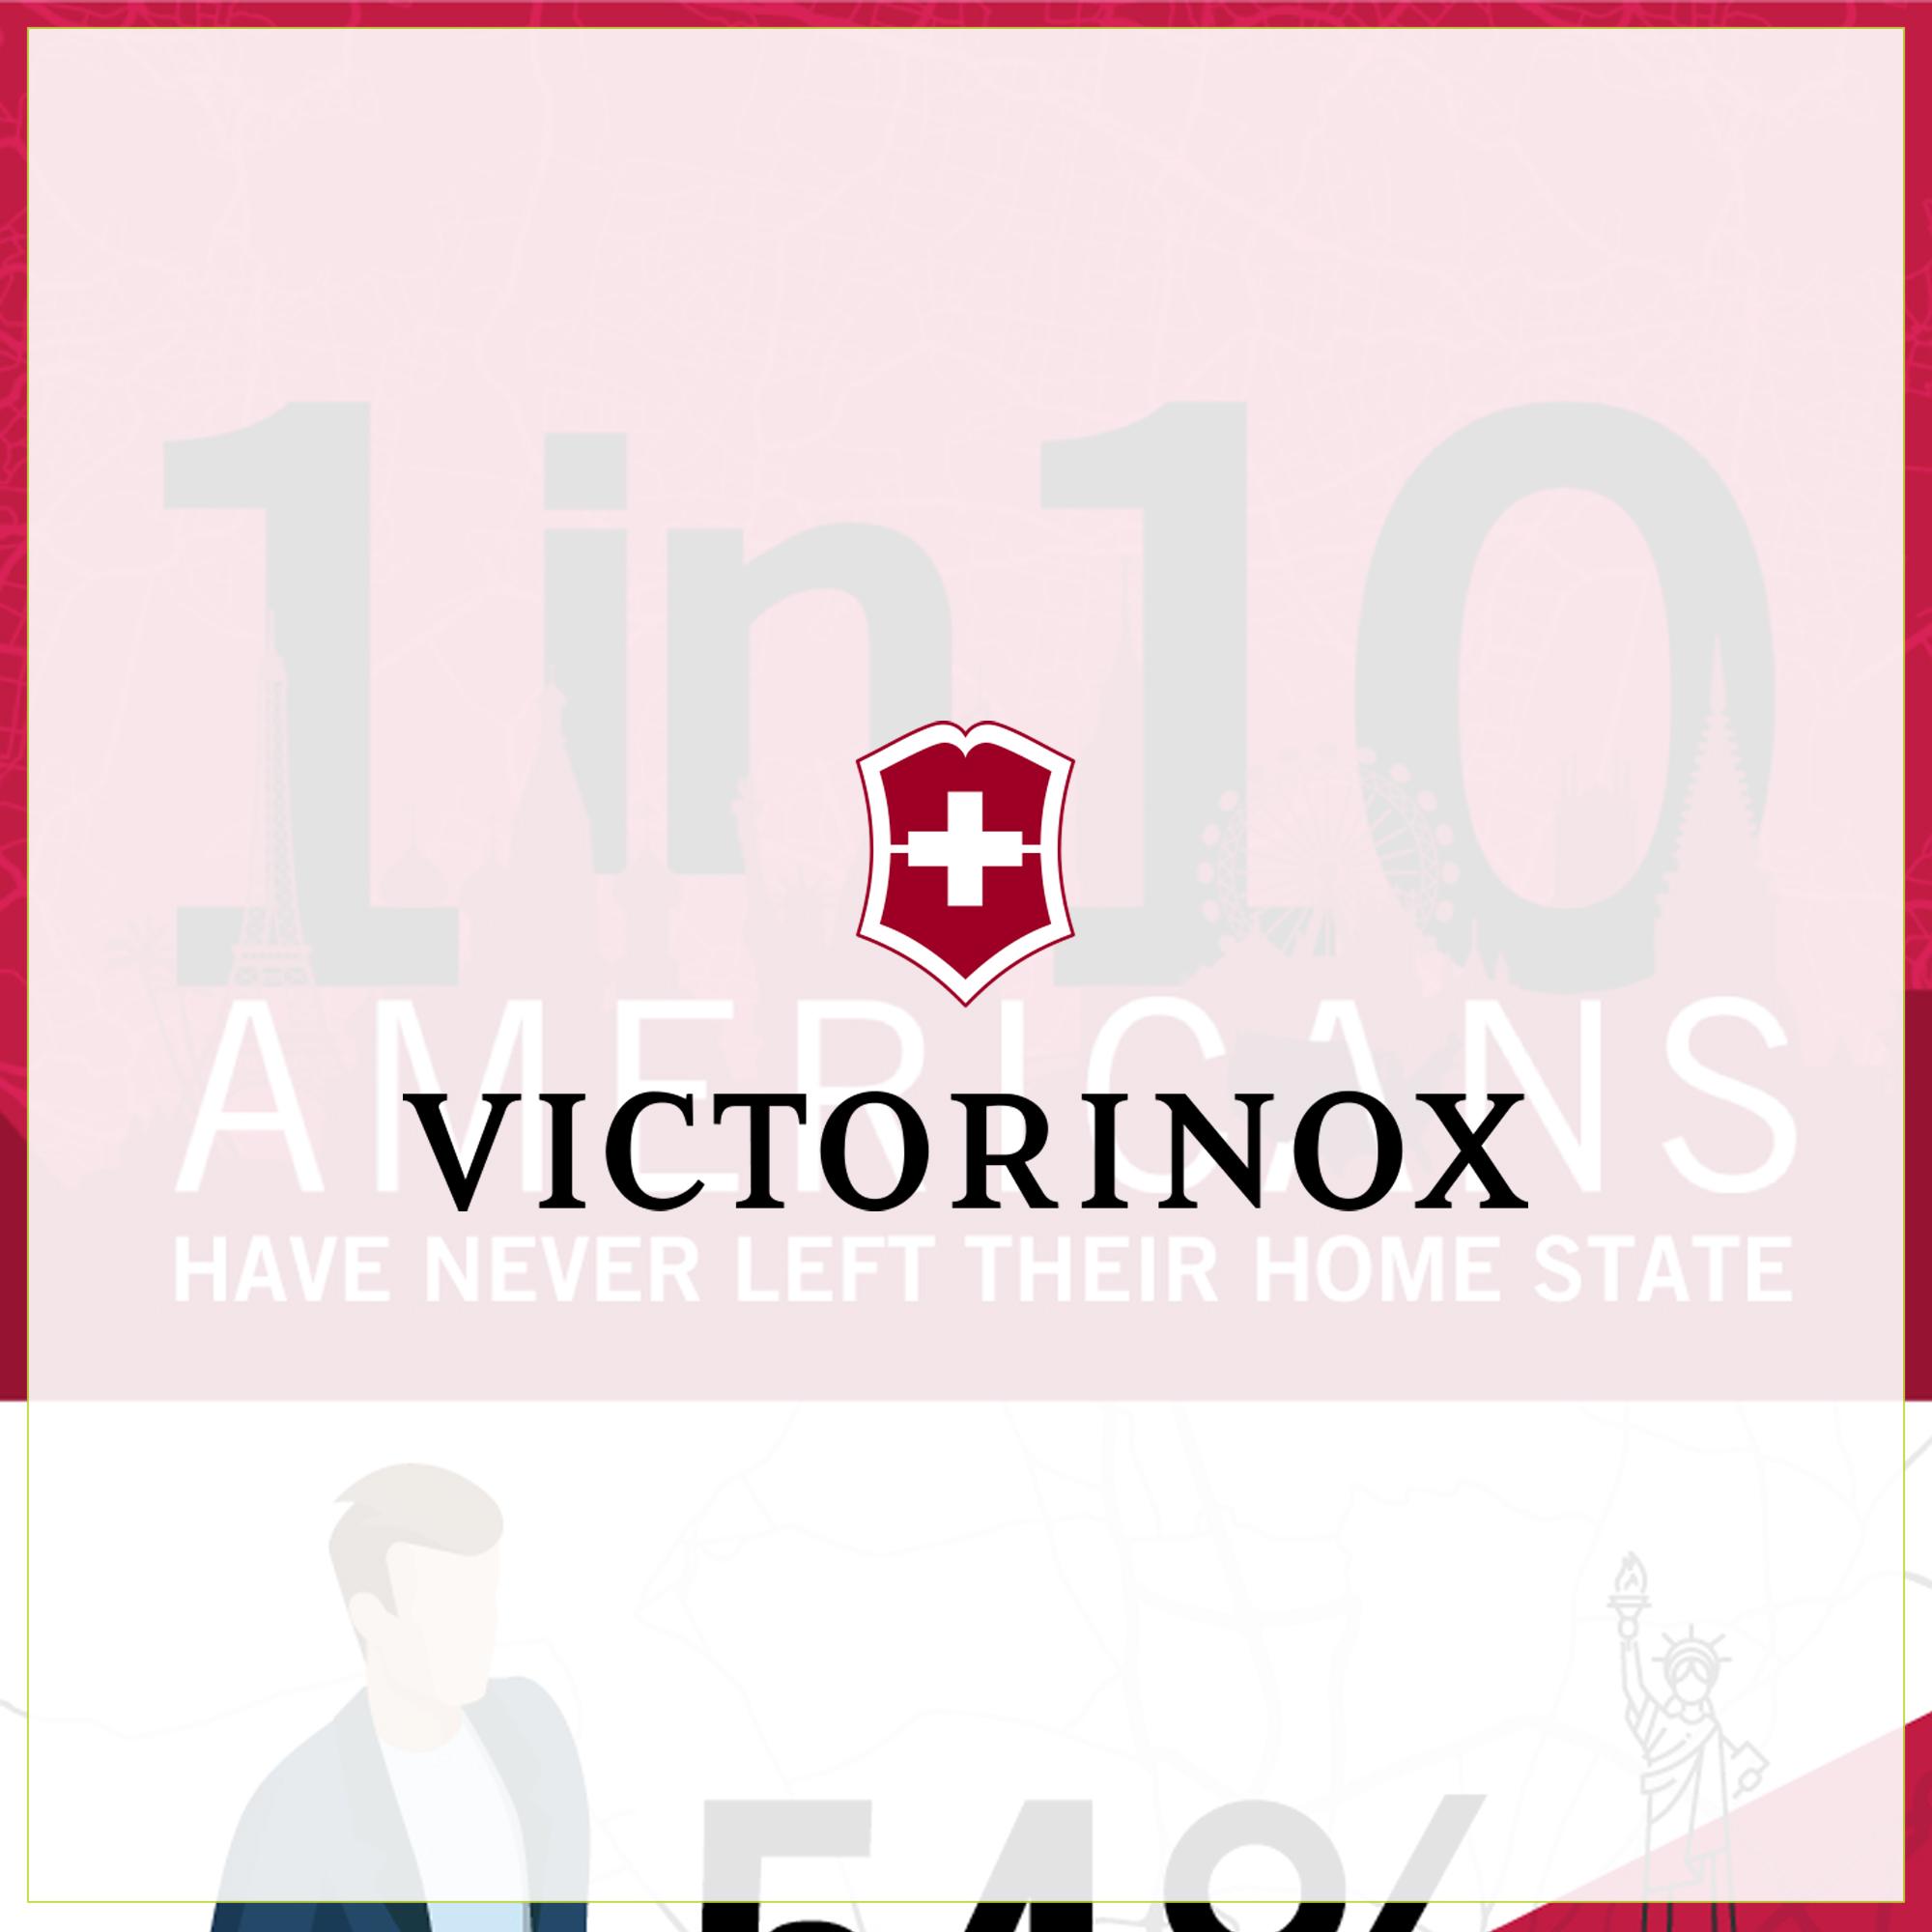 victorinox.jpg